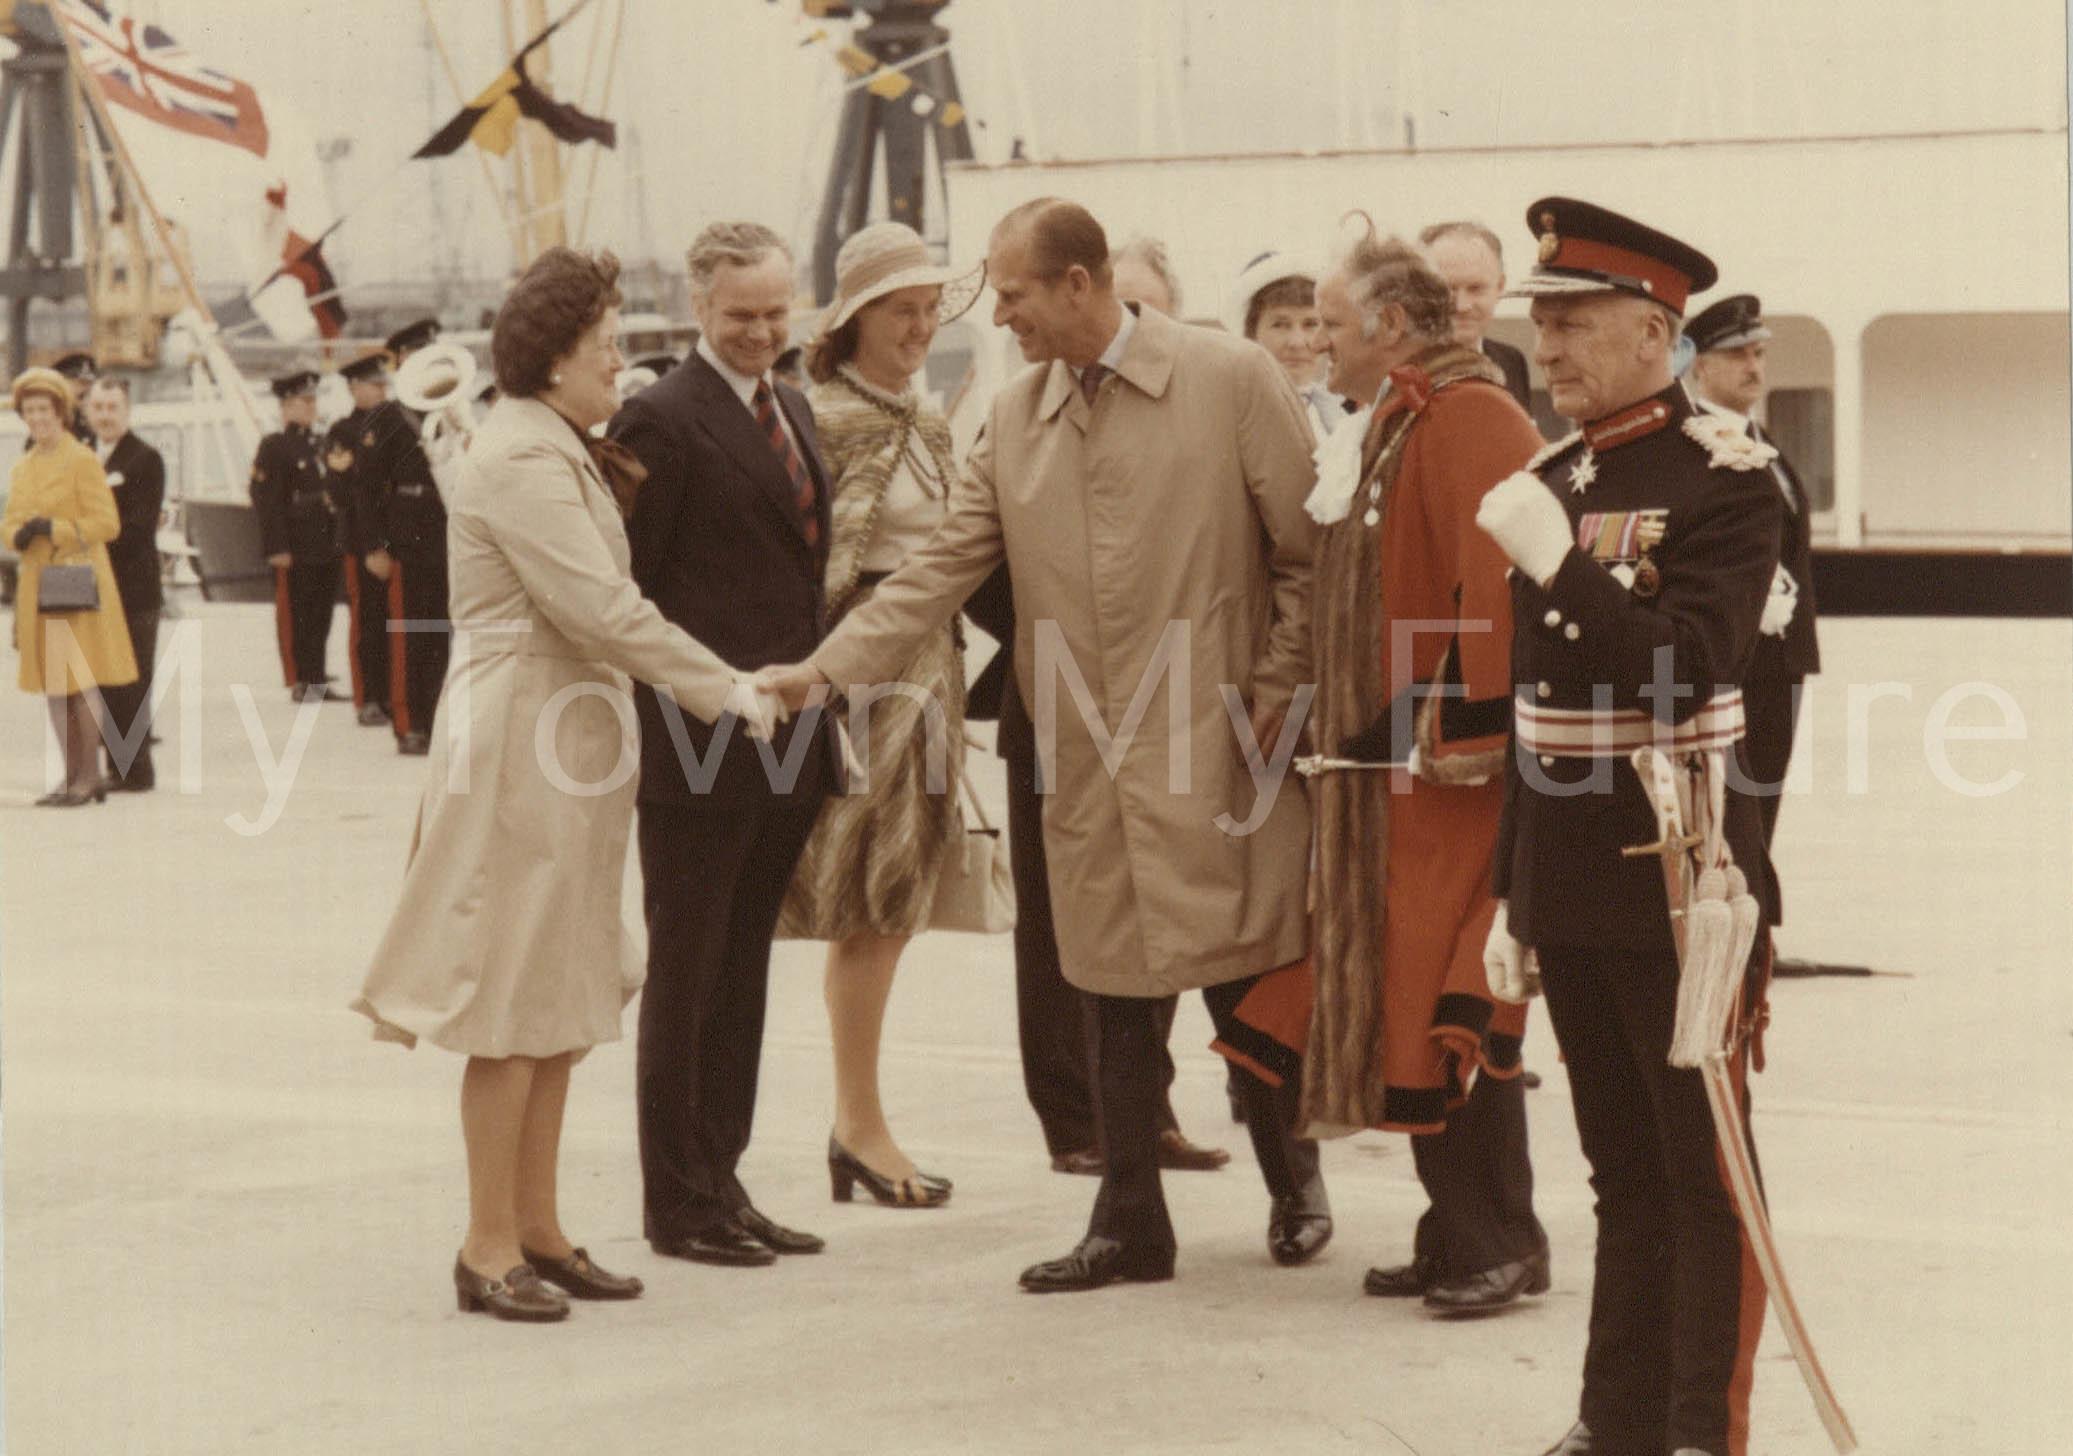 Queen Elizabeth Silver Jubilee visit to Cleveland (14 July 1977)